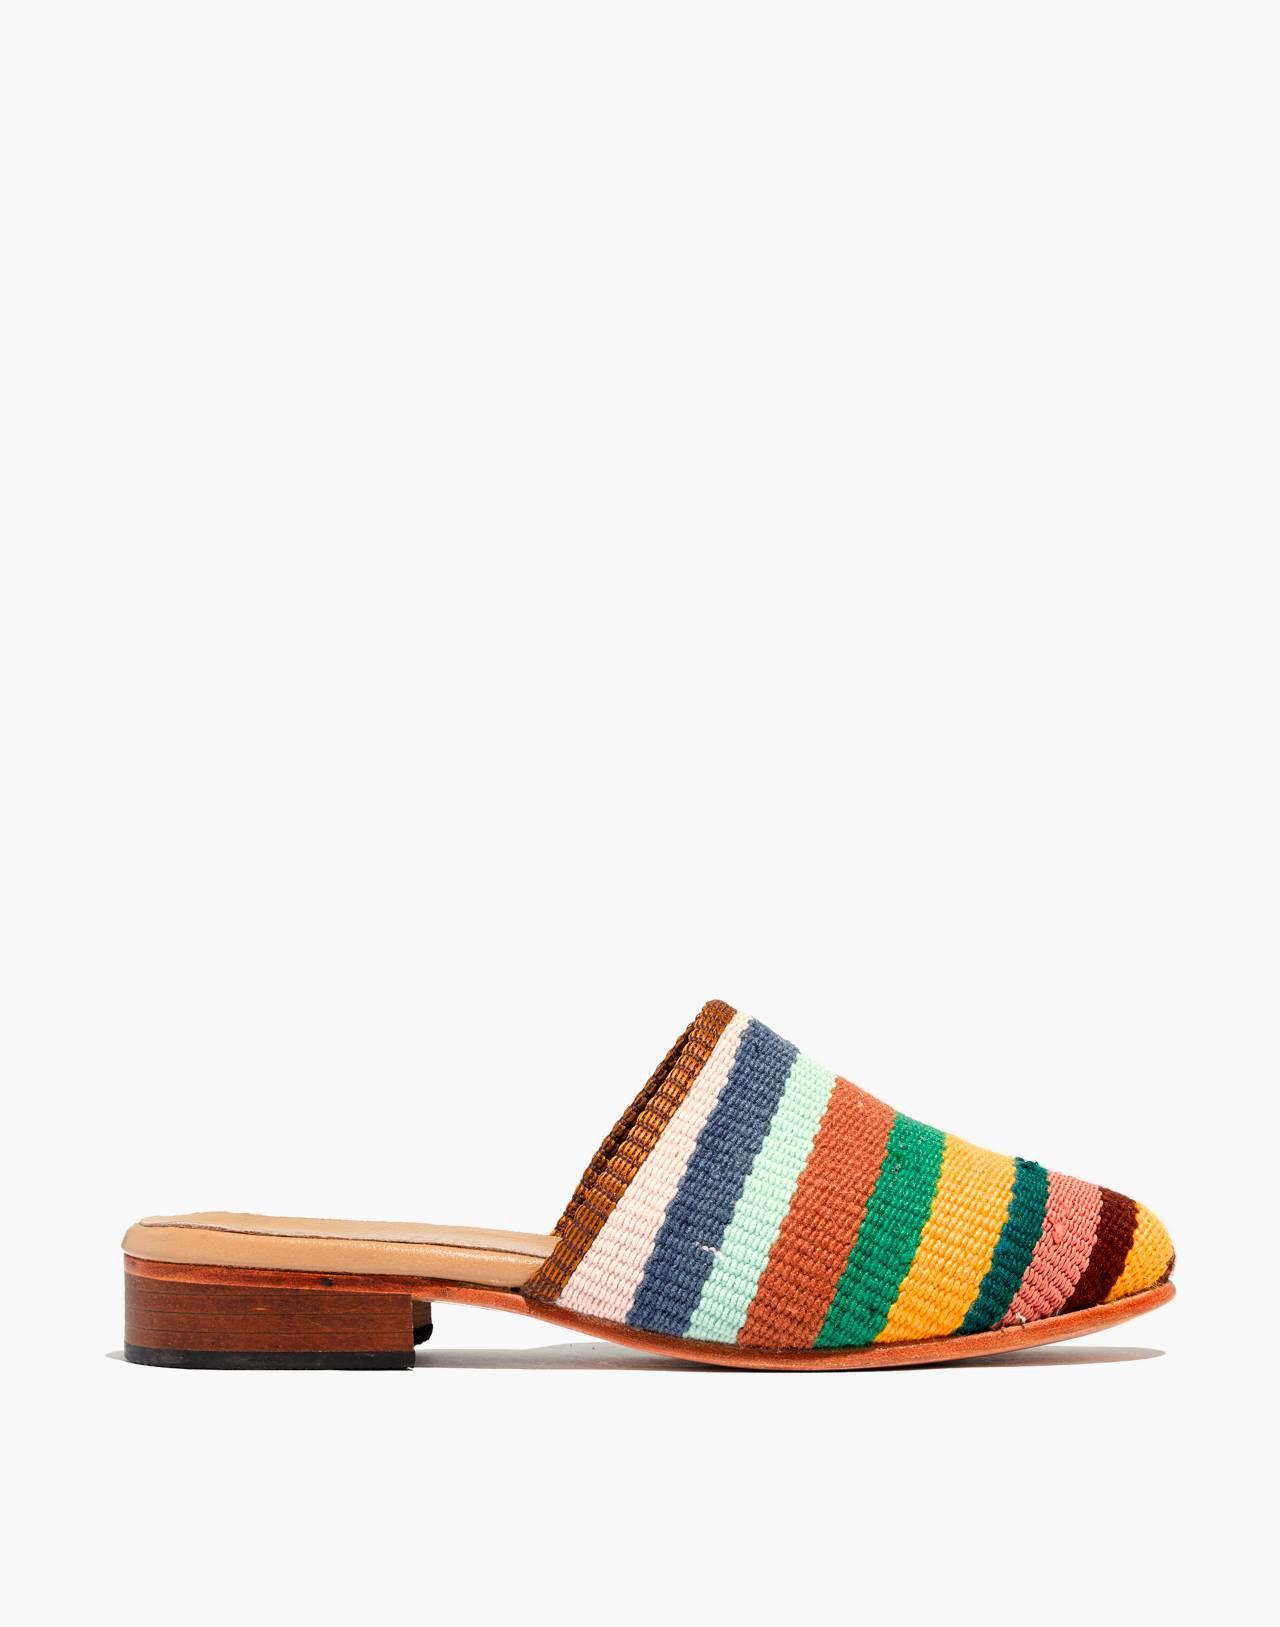 Artemis Design Co. Kilim Slides in bright stripes image 2